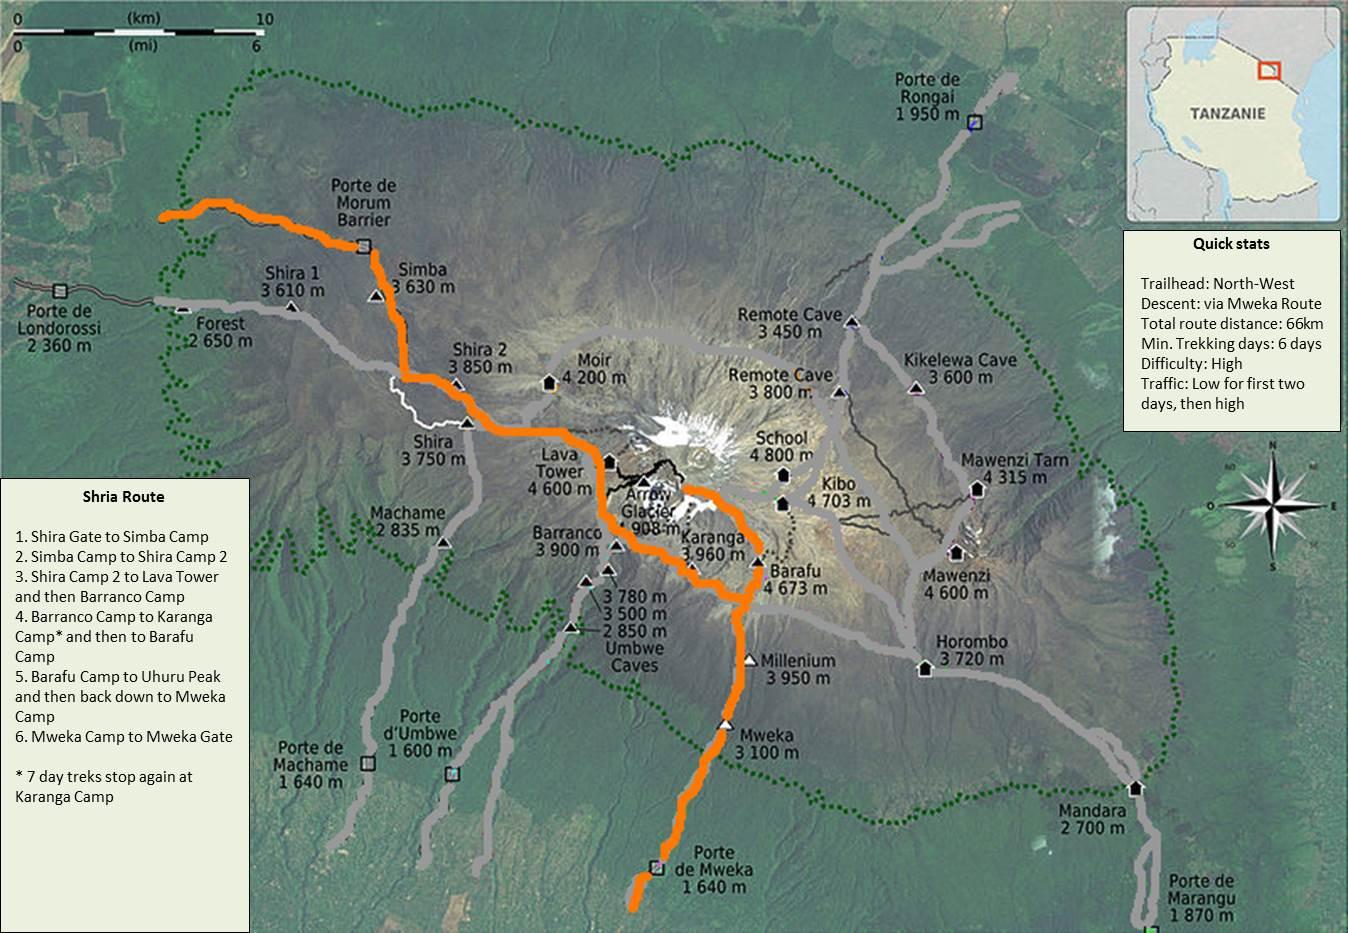 22.-Shira-Route-Map.jpg